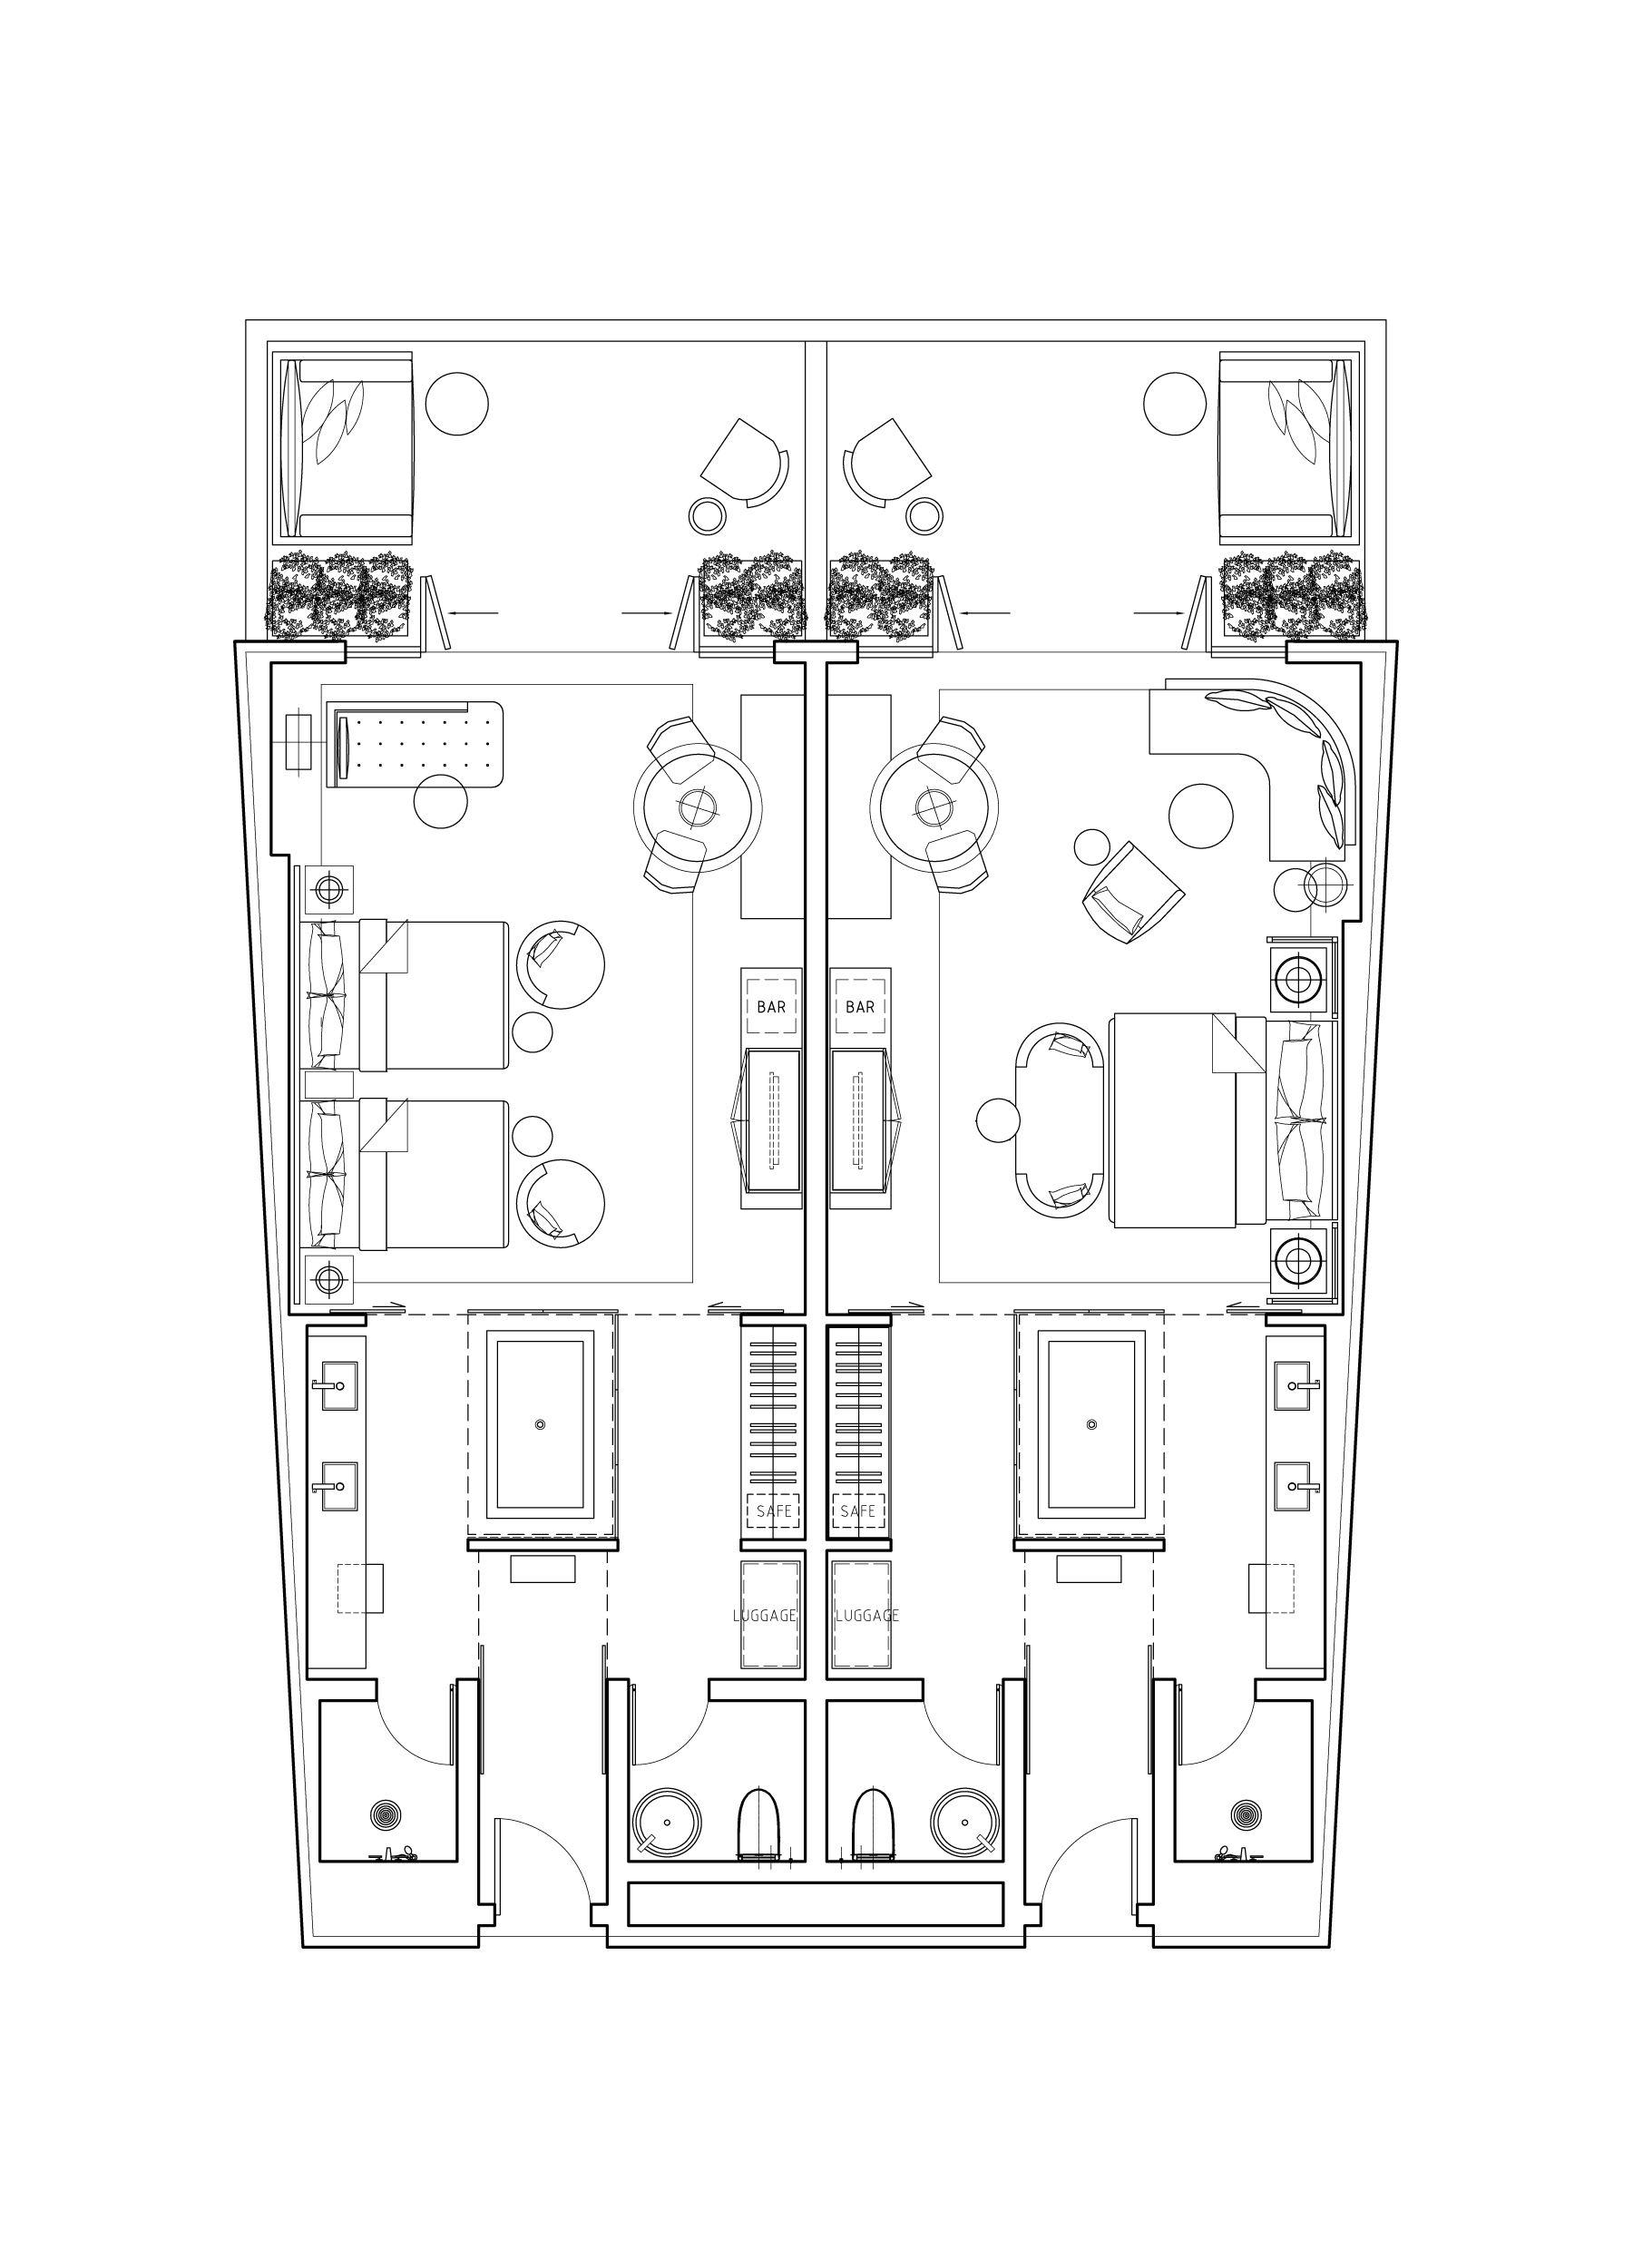 Hotel Room Plan: Hotel Plan, Hotel Floor Plan, Hotel Room Plan